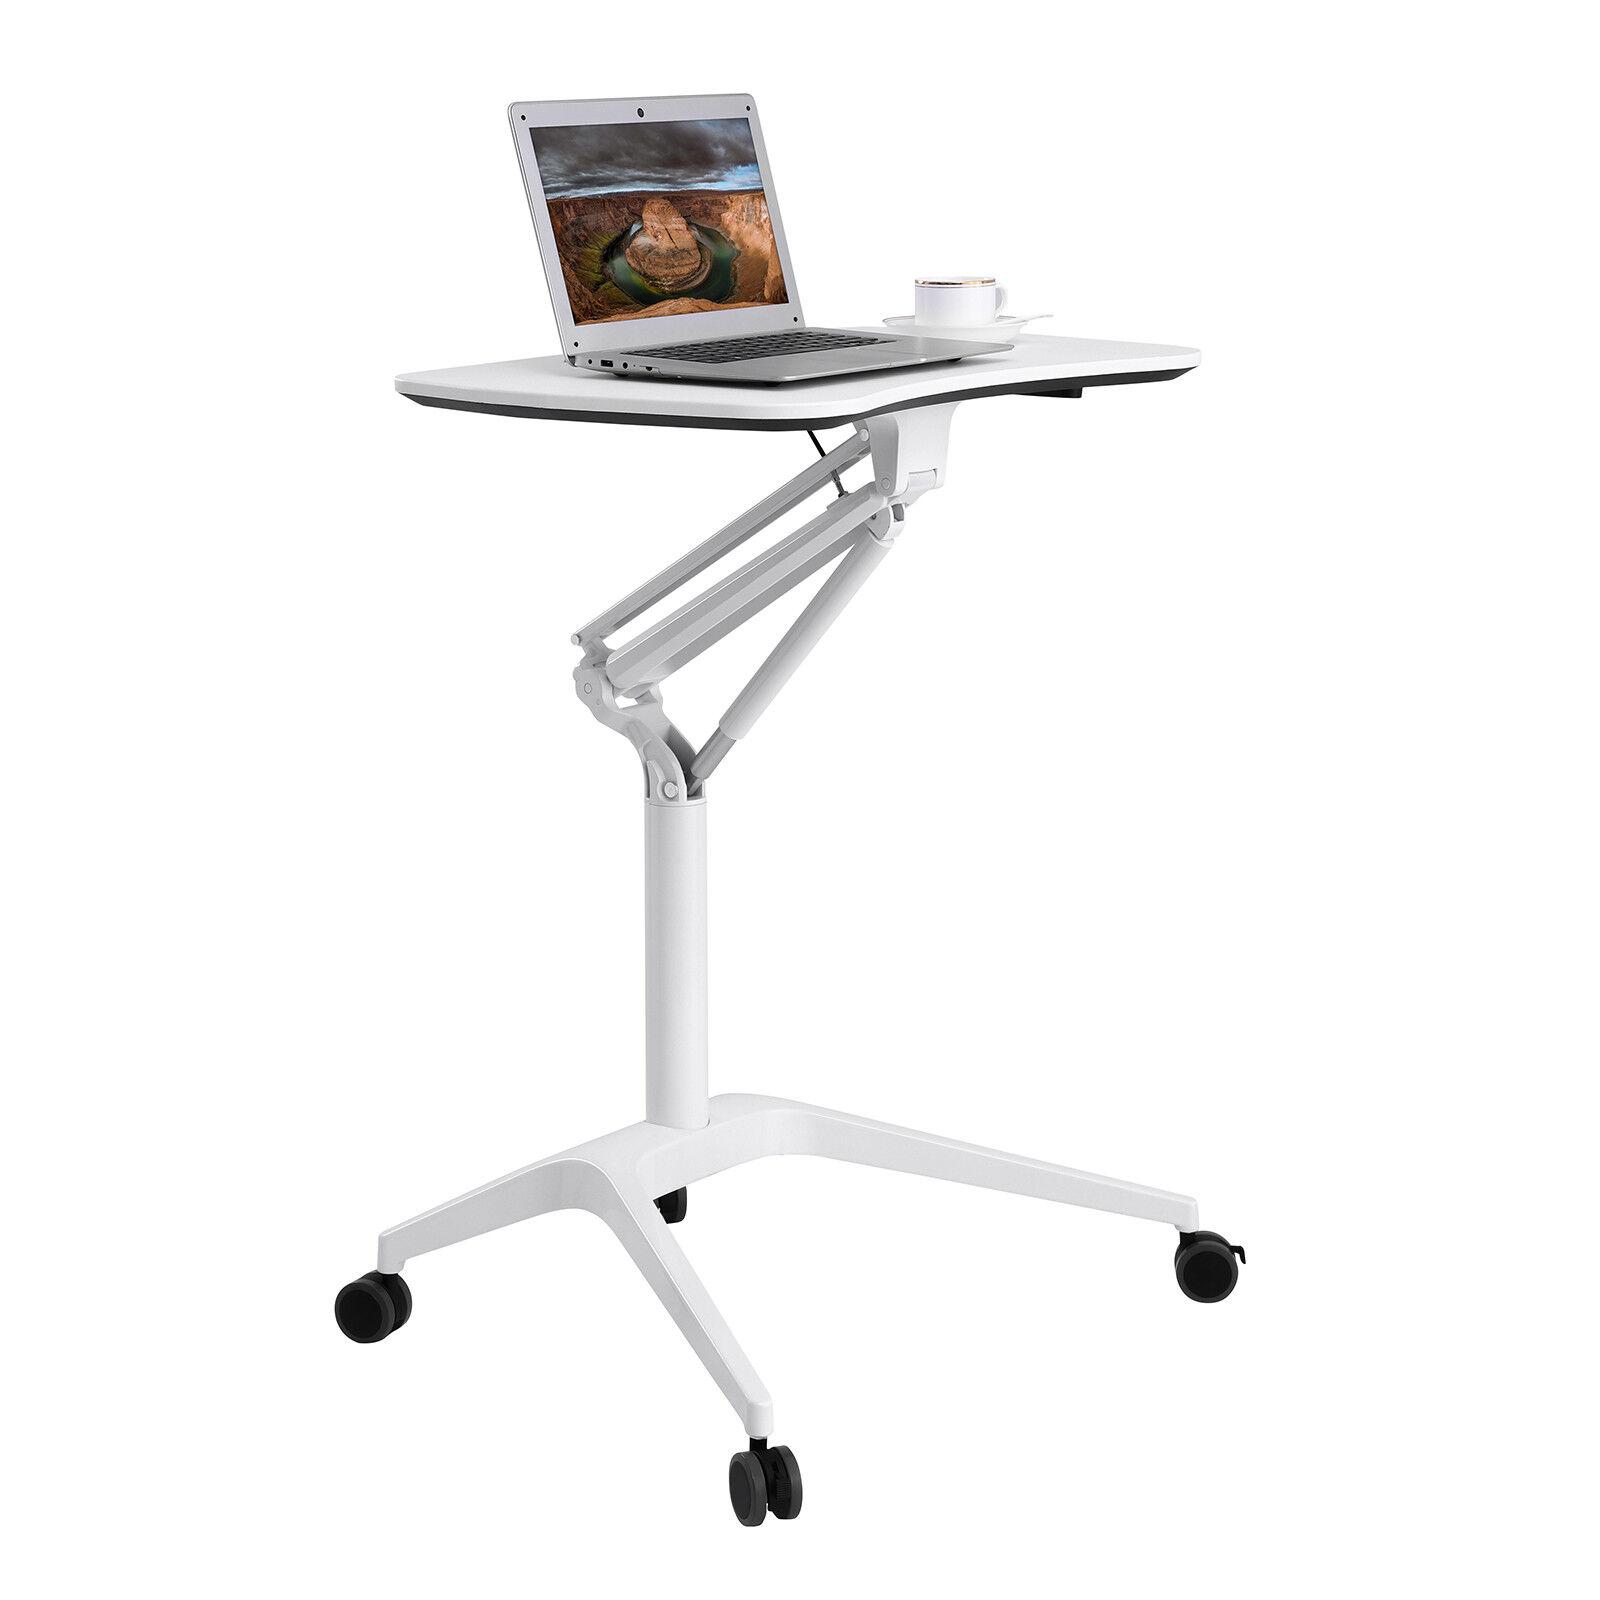 Mesa Mesa Mesa auxiliar mesa cuidados portátil mesa mesa para ordenador escritorios móvil lad02wt 863799